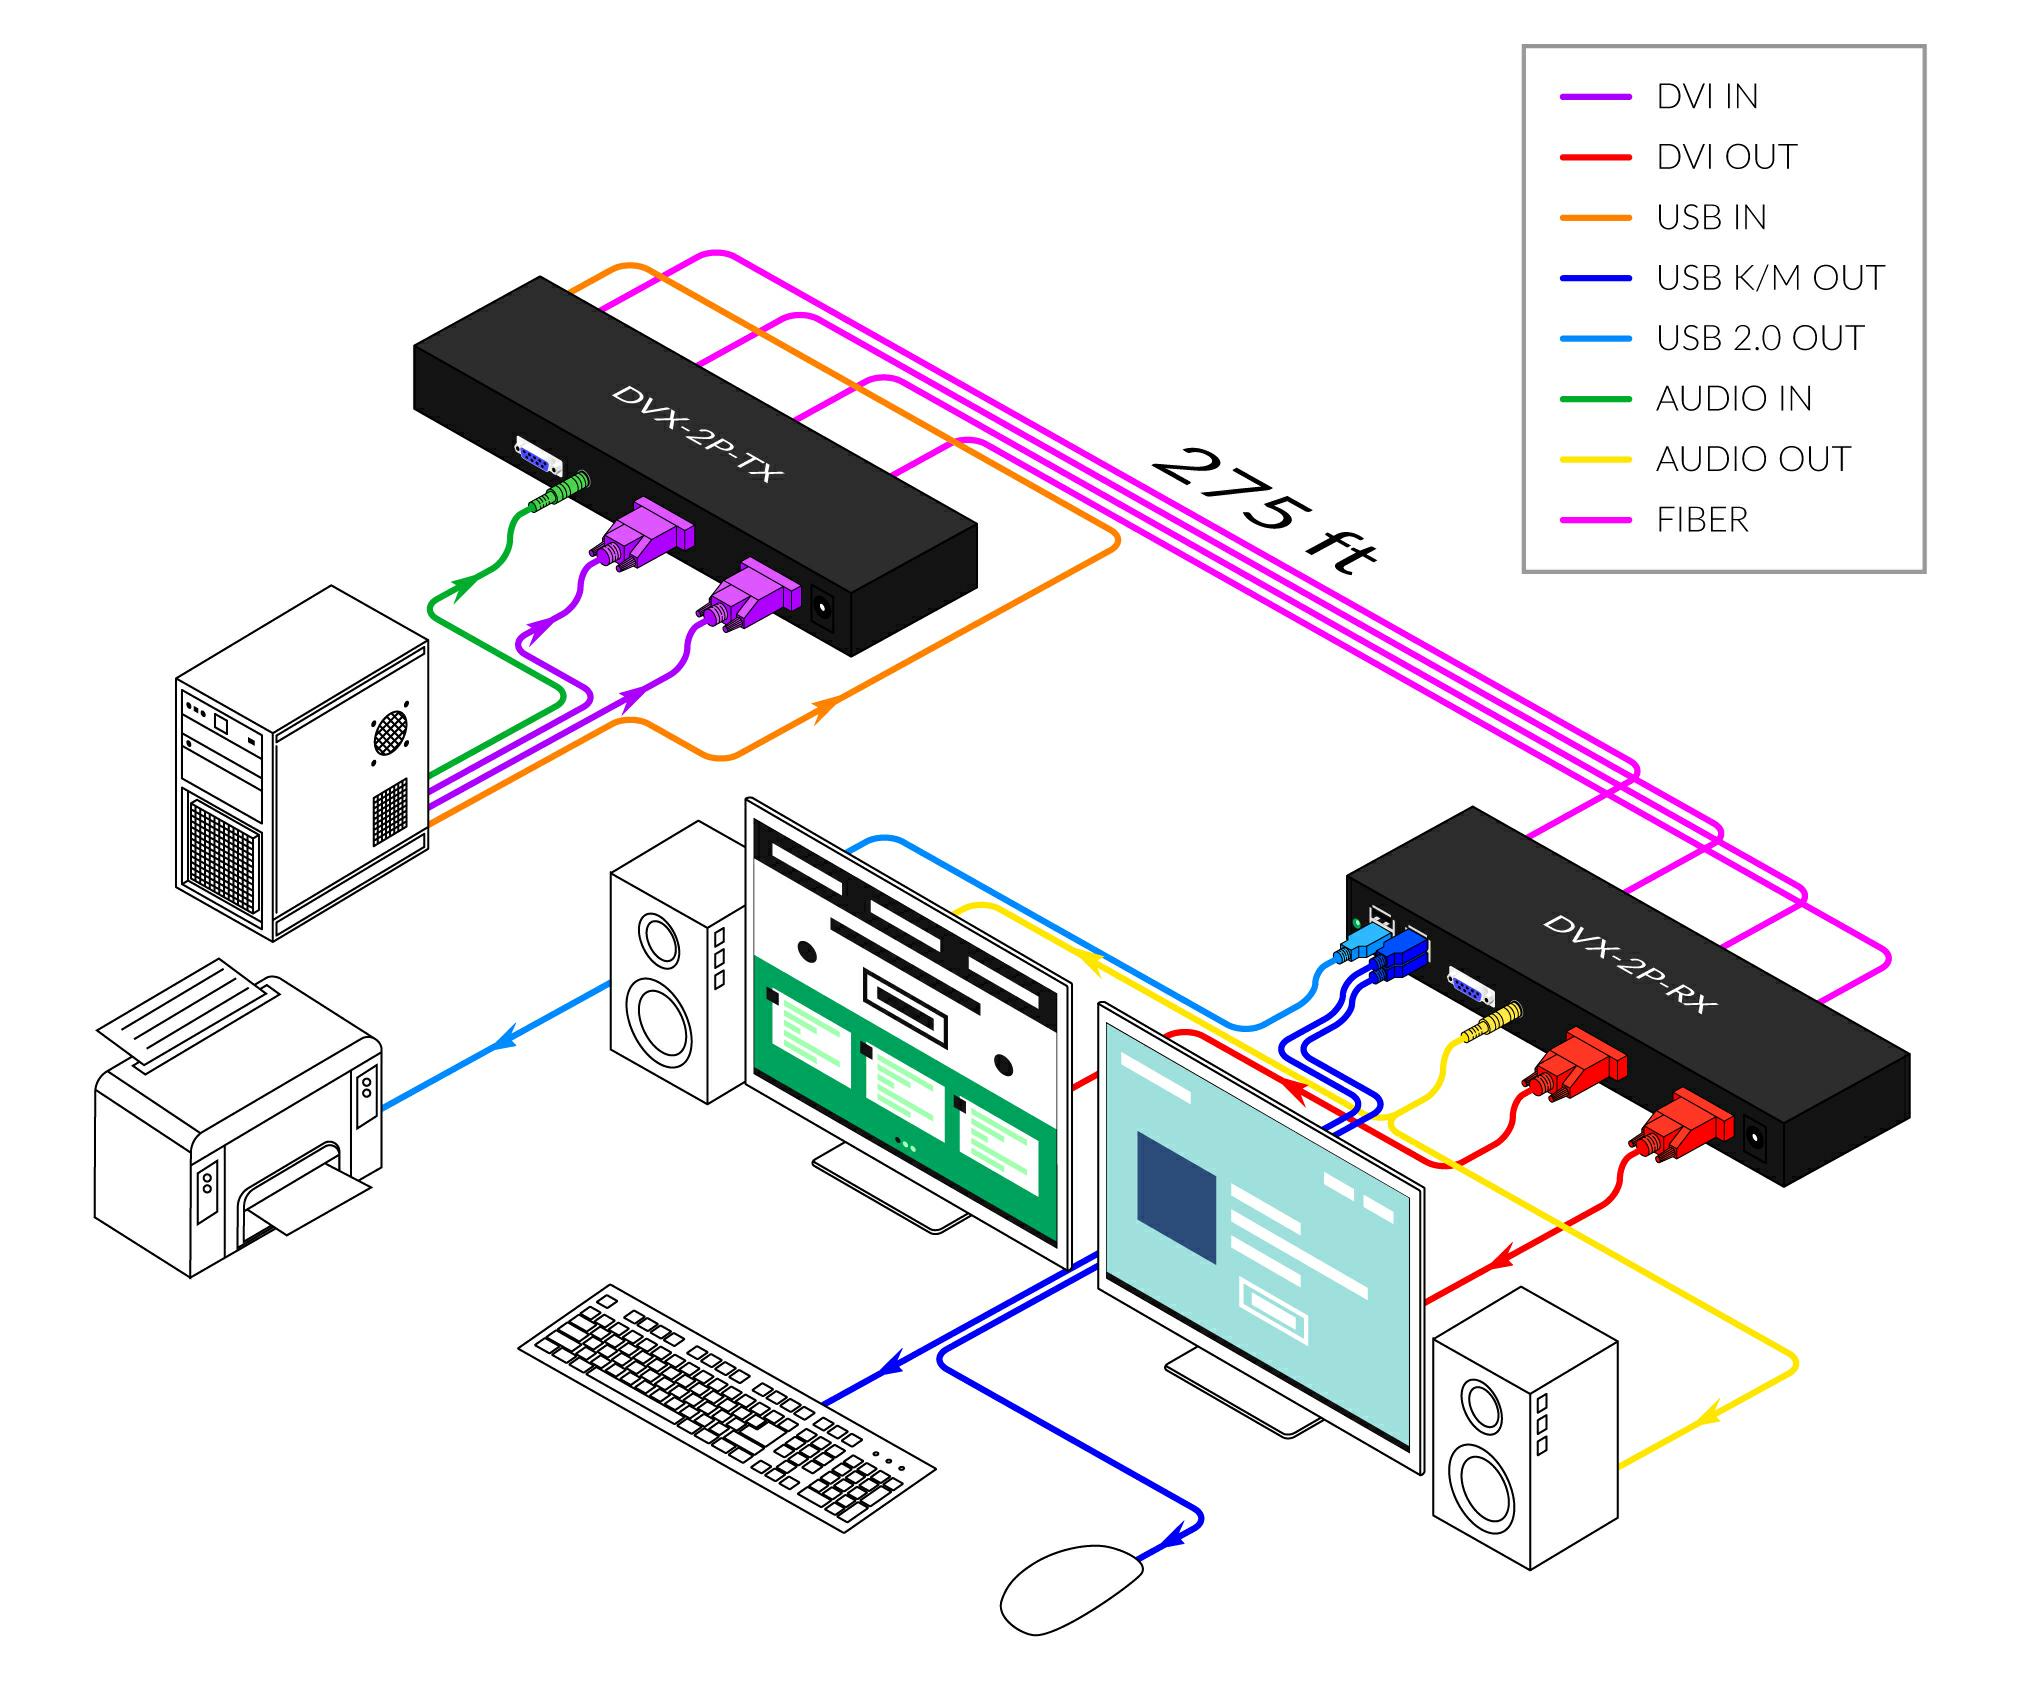 DVX-2P diagram